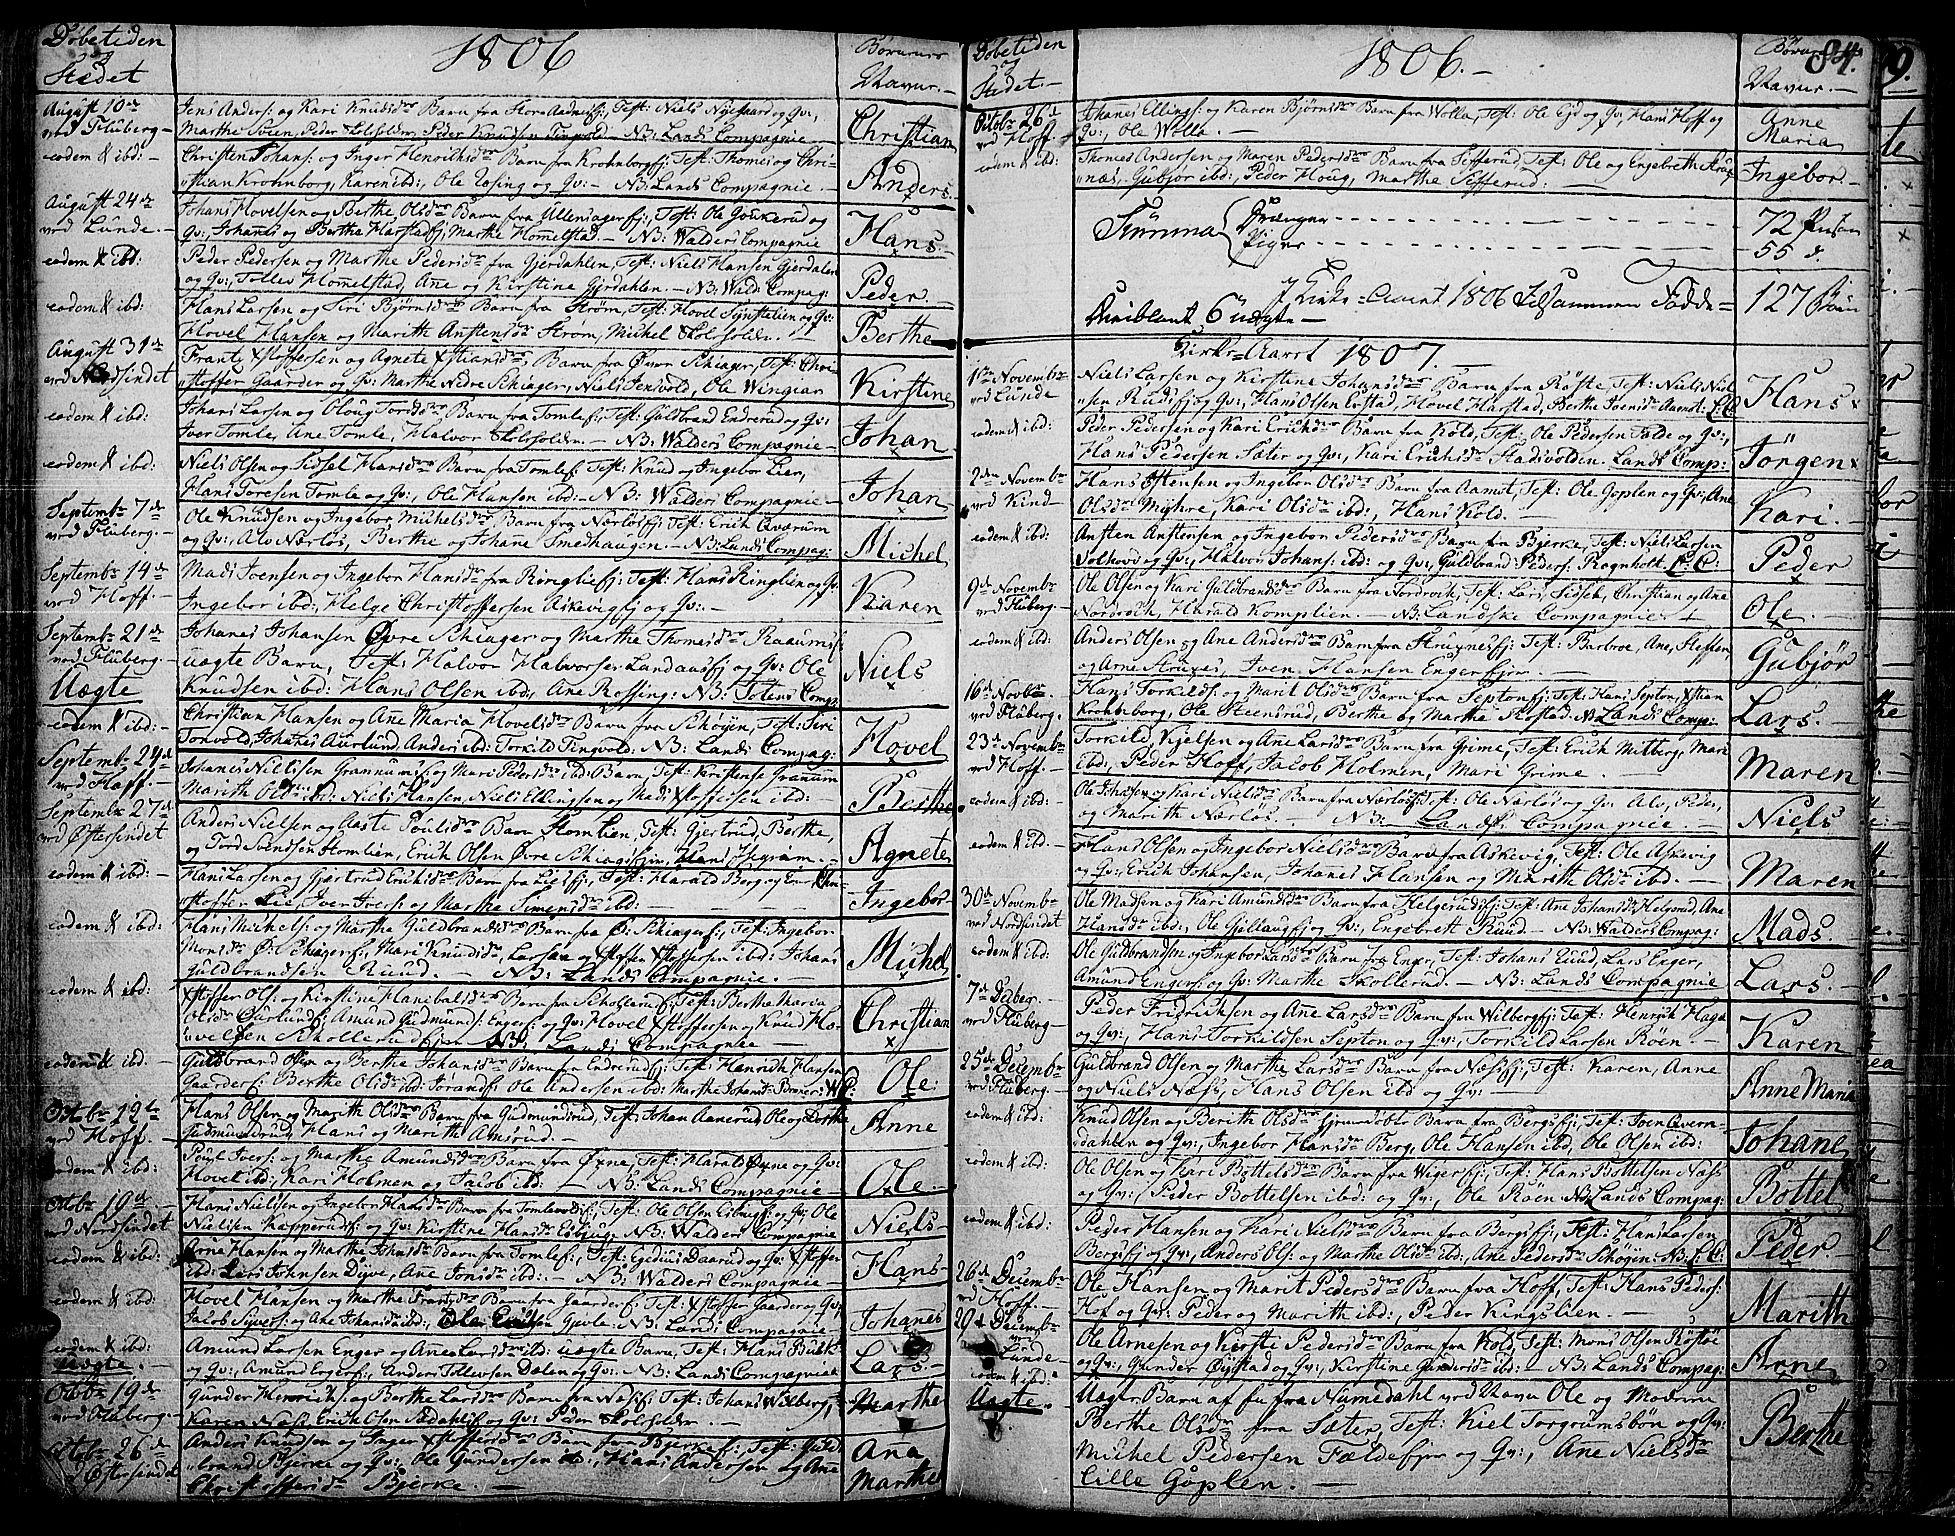 SAH, Land prestekontor, Ministerialbok nr. 6, 1784-1813, s. 84